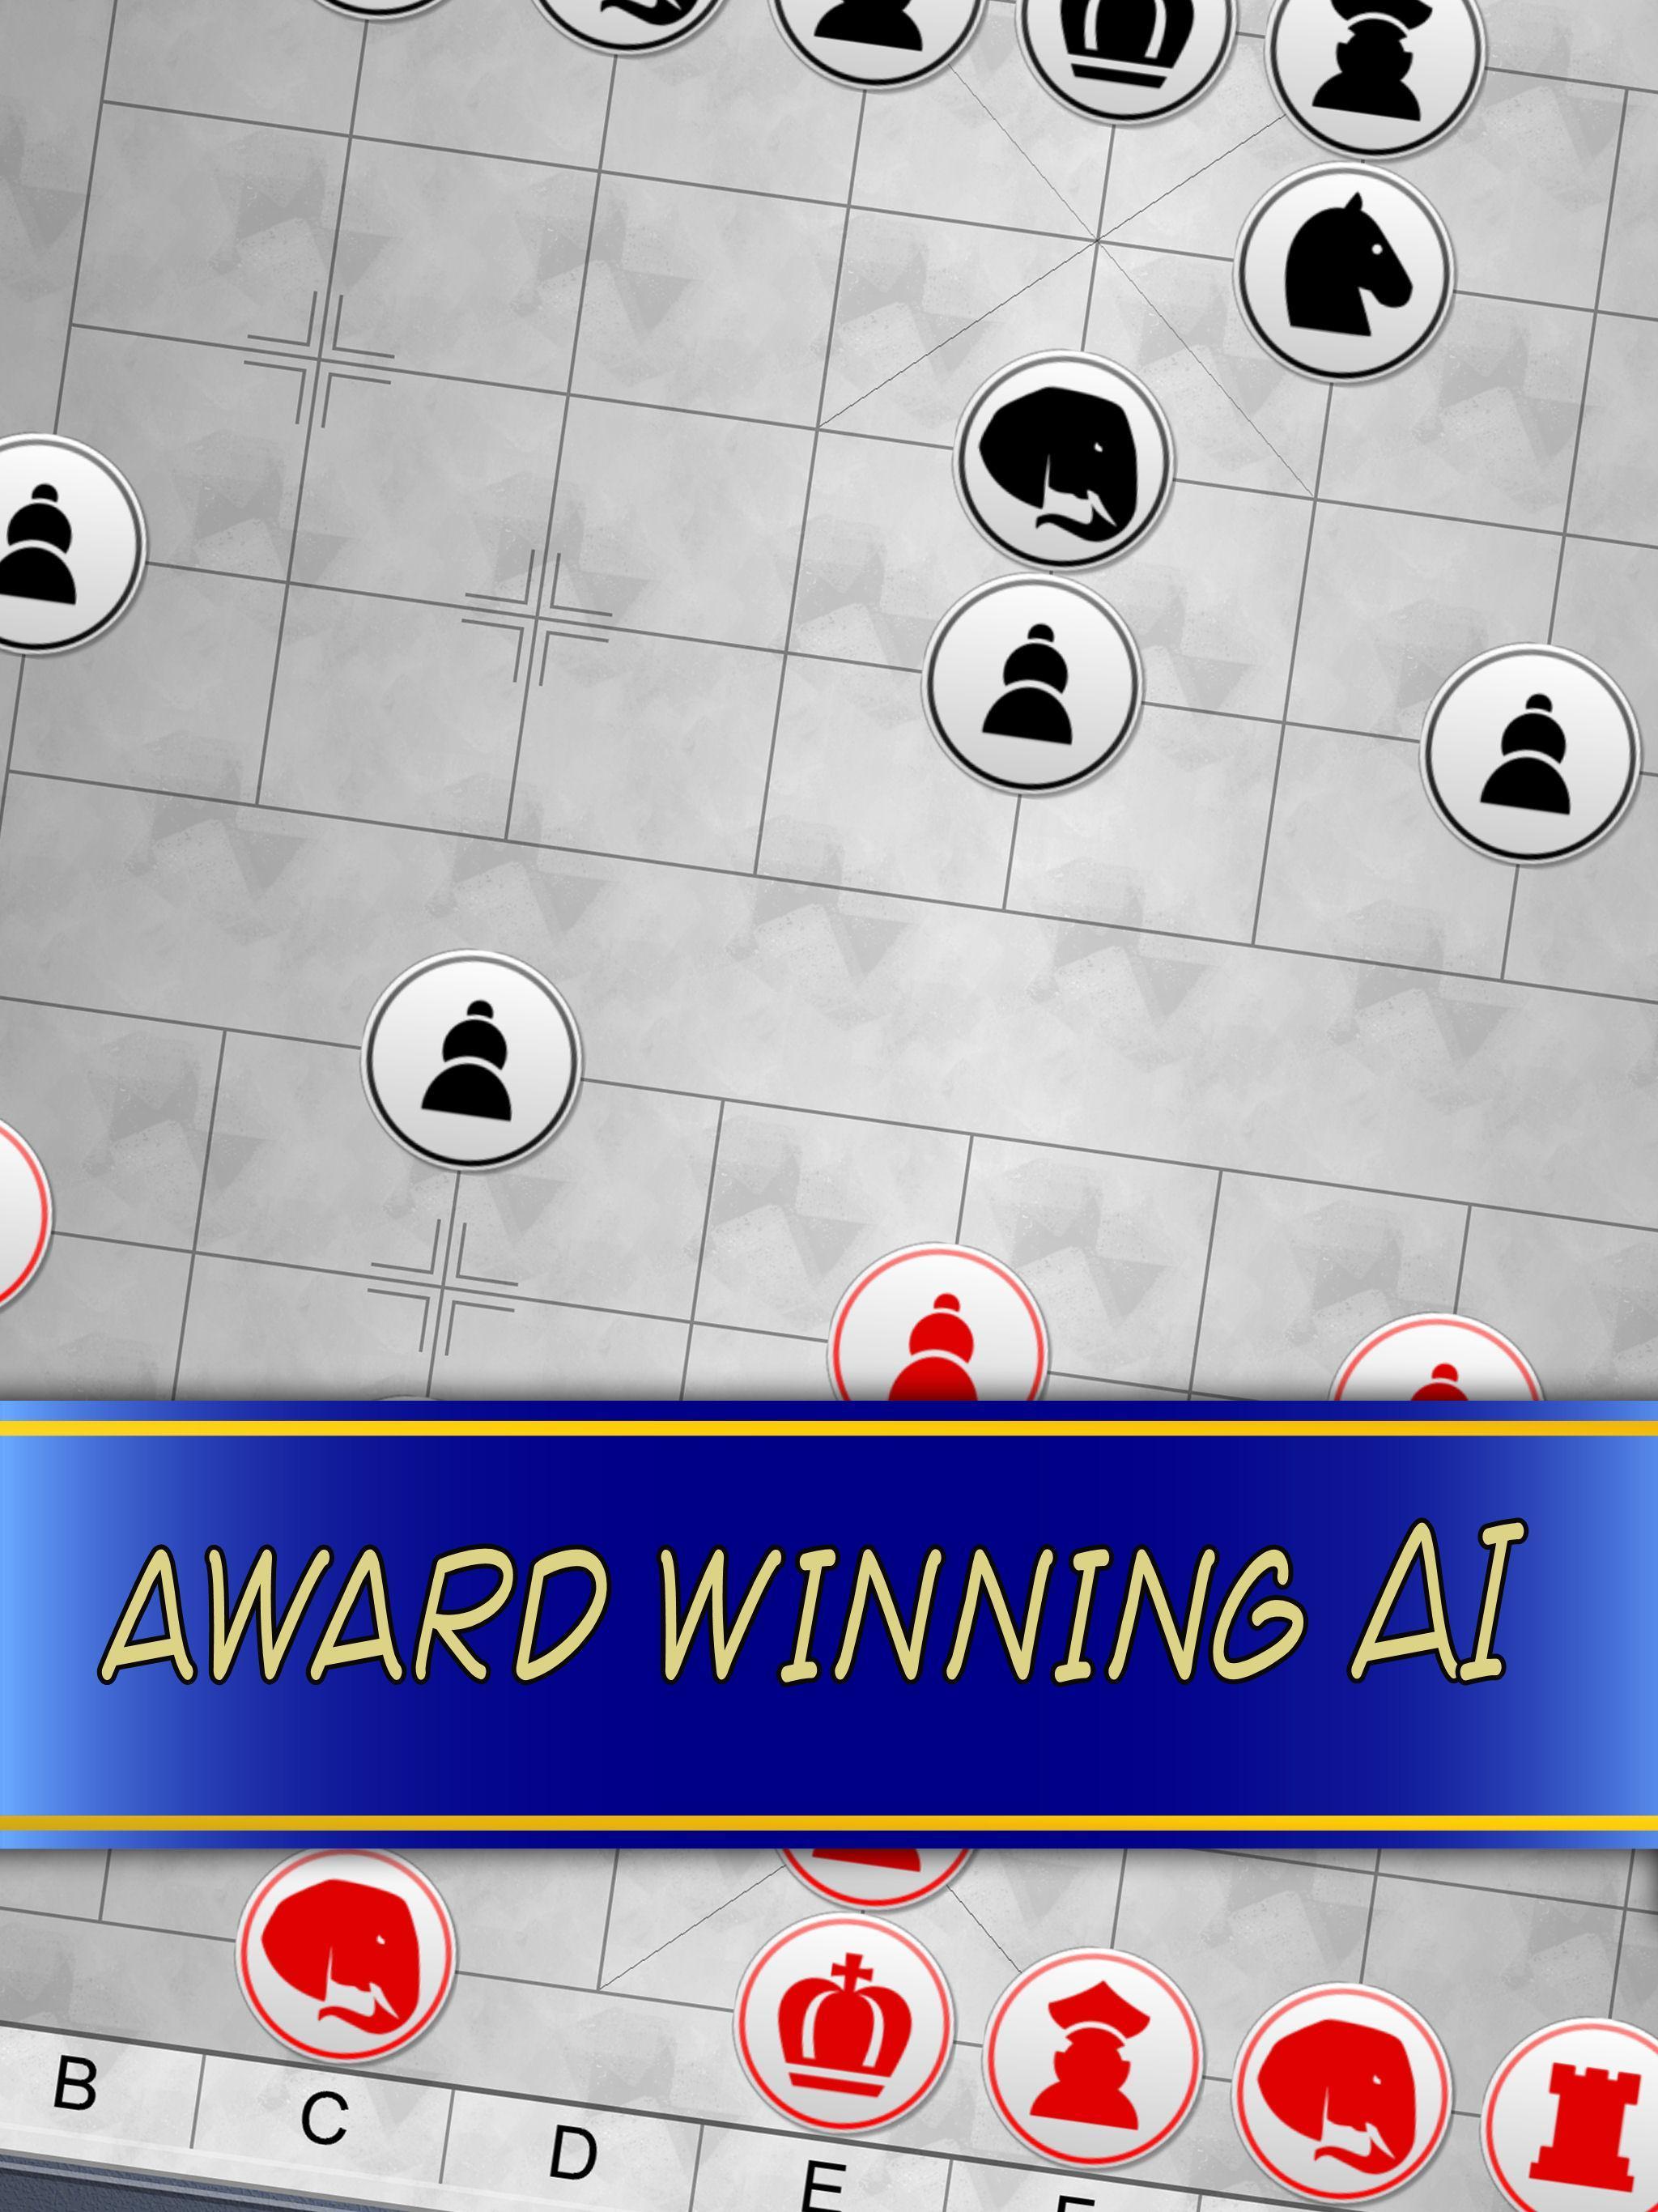 Chinese Chess V+, multiplayer Xiangqi board game 5.25.65 Screenshot 7